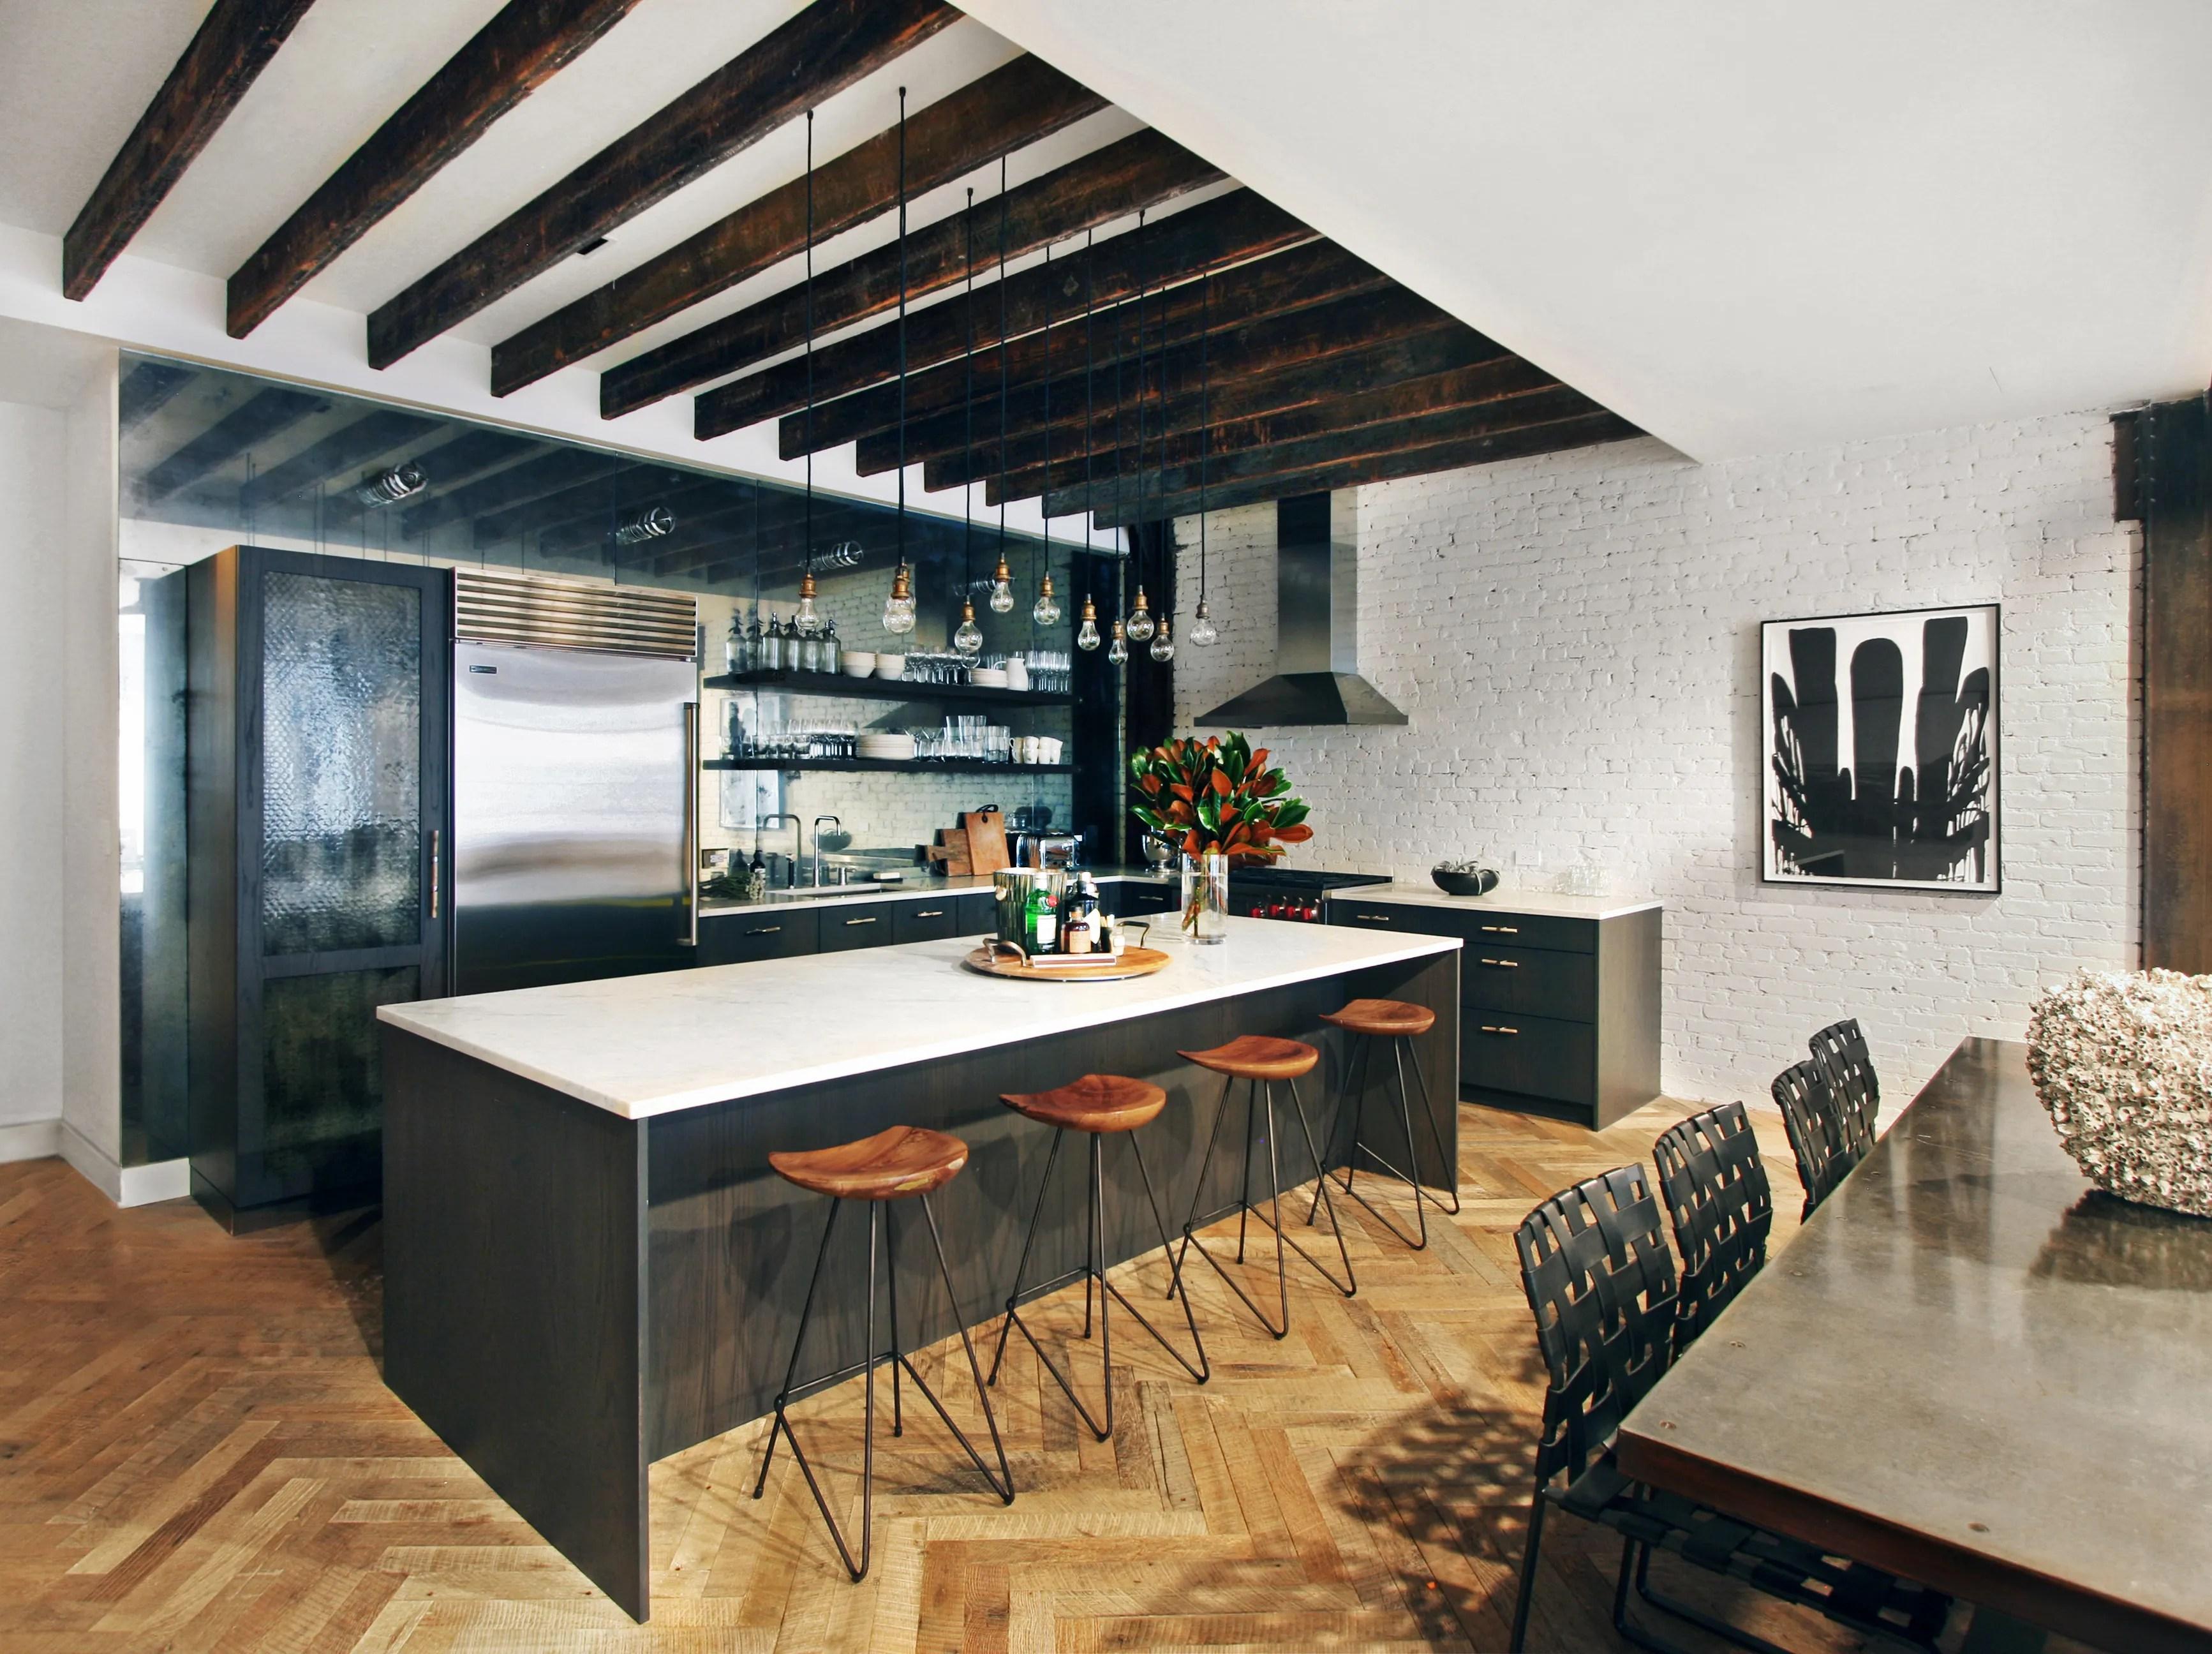 Fullsize Of Kitchen Set Design